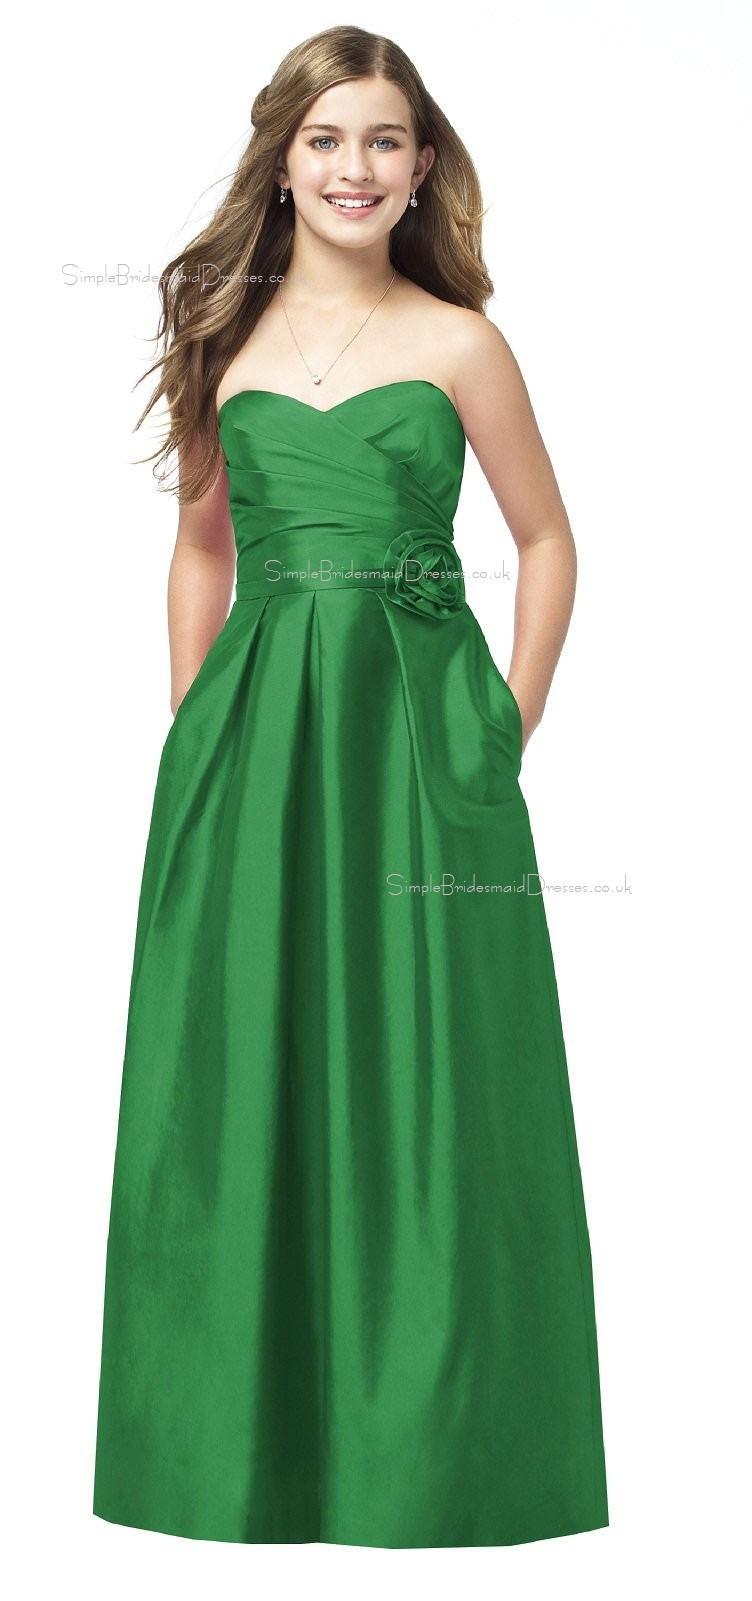 Green a line sweetheart strapless satin junior bridesmaid dresses ombrellifo Choice Image